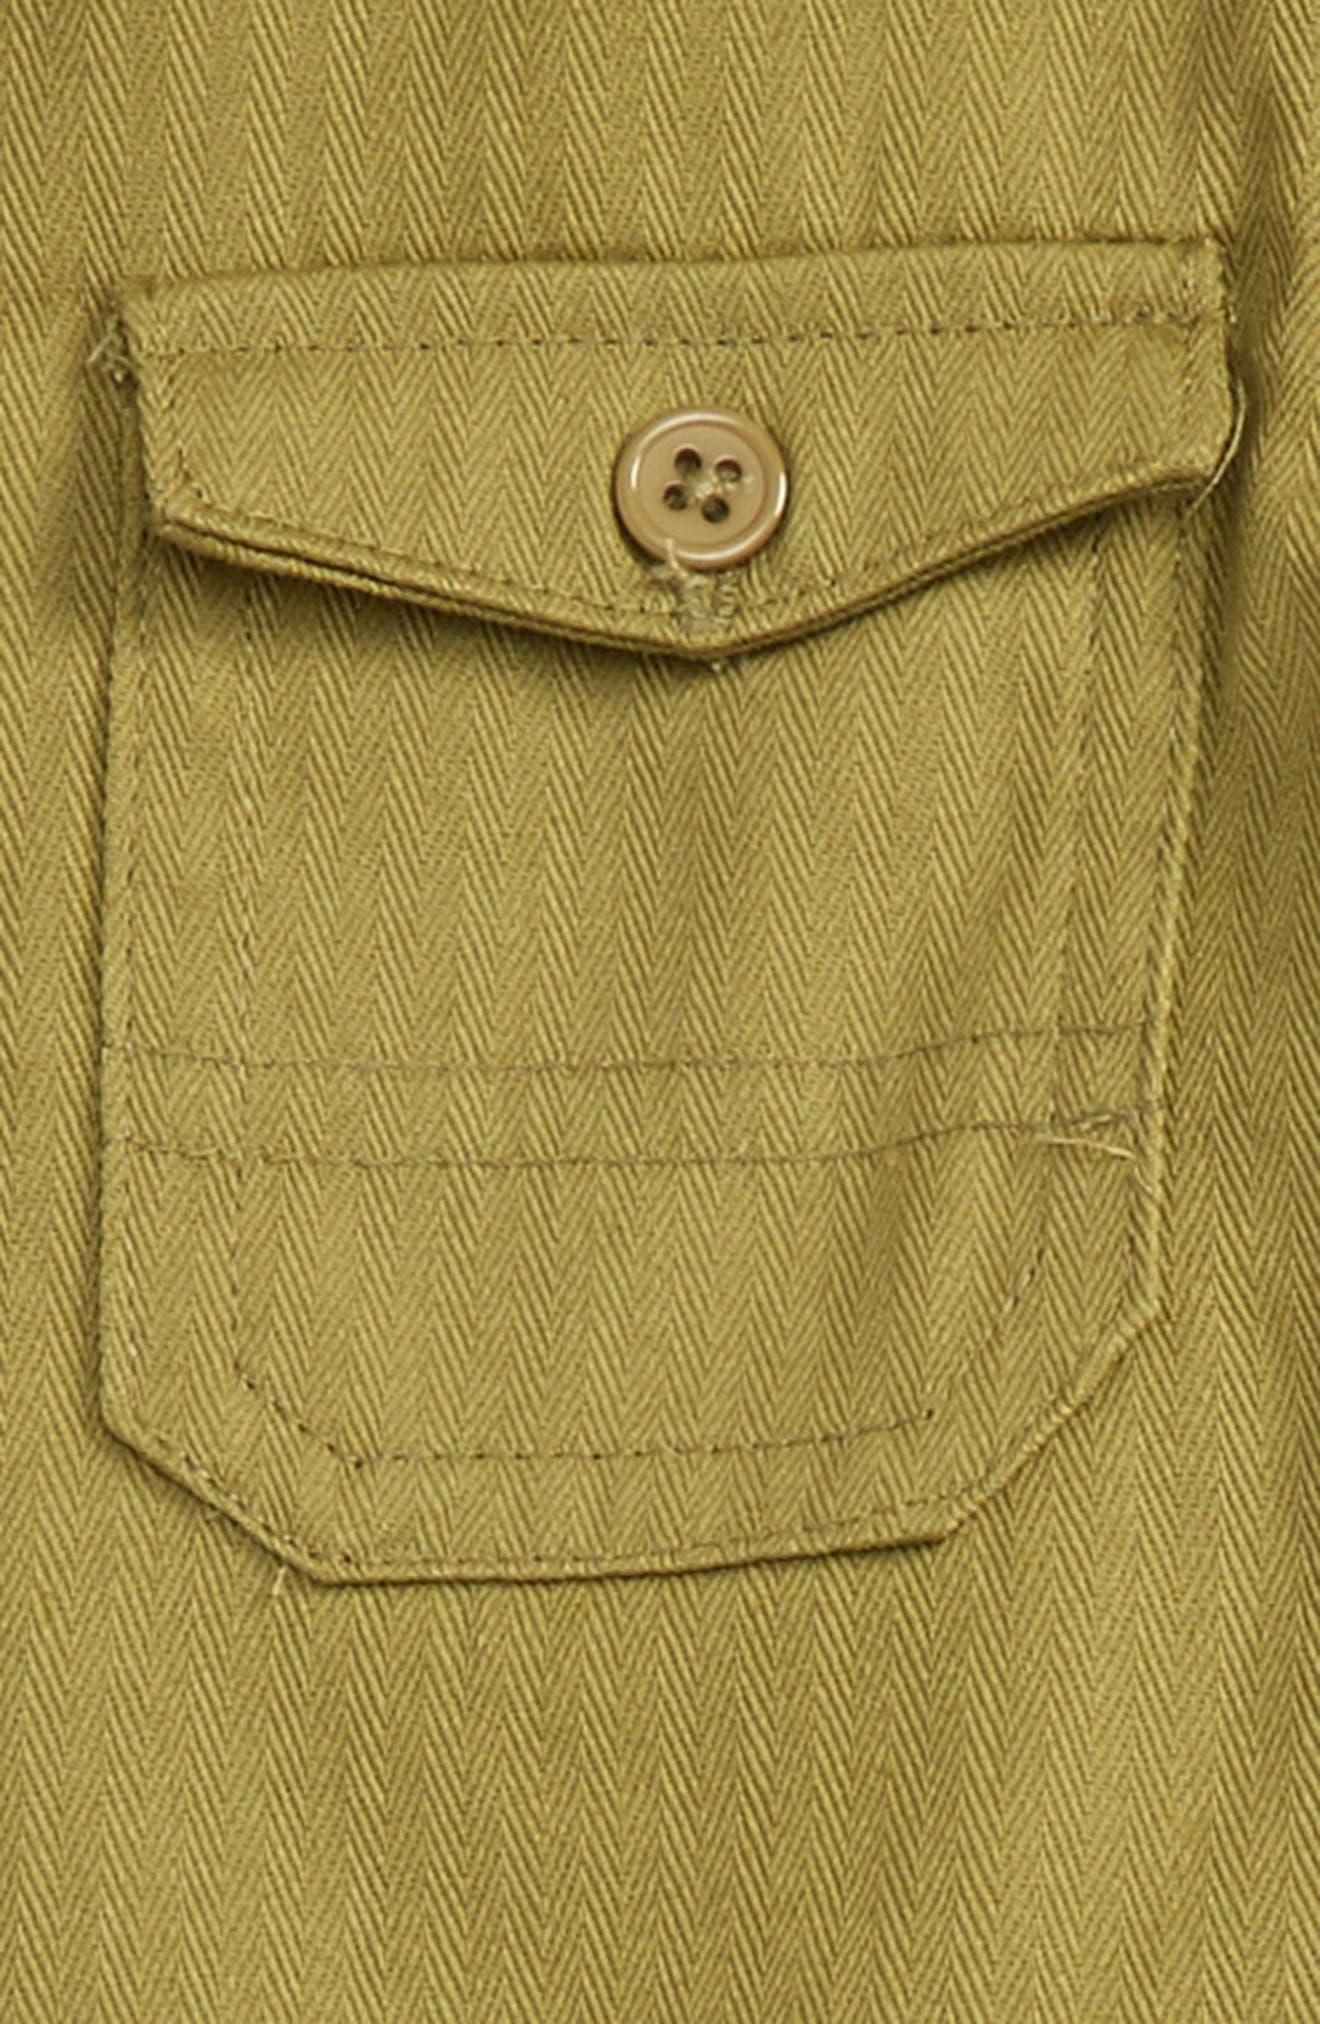 Alternate Image 2  - Hudson Kids Woven Shirt & Sweatpants Set (Baby Boys)